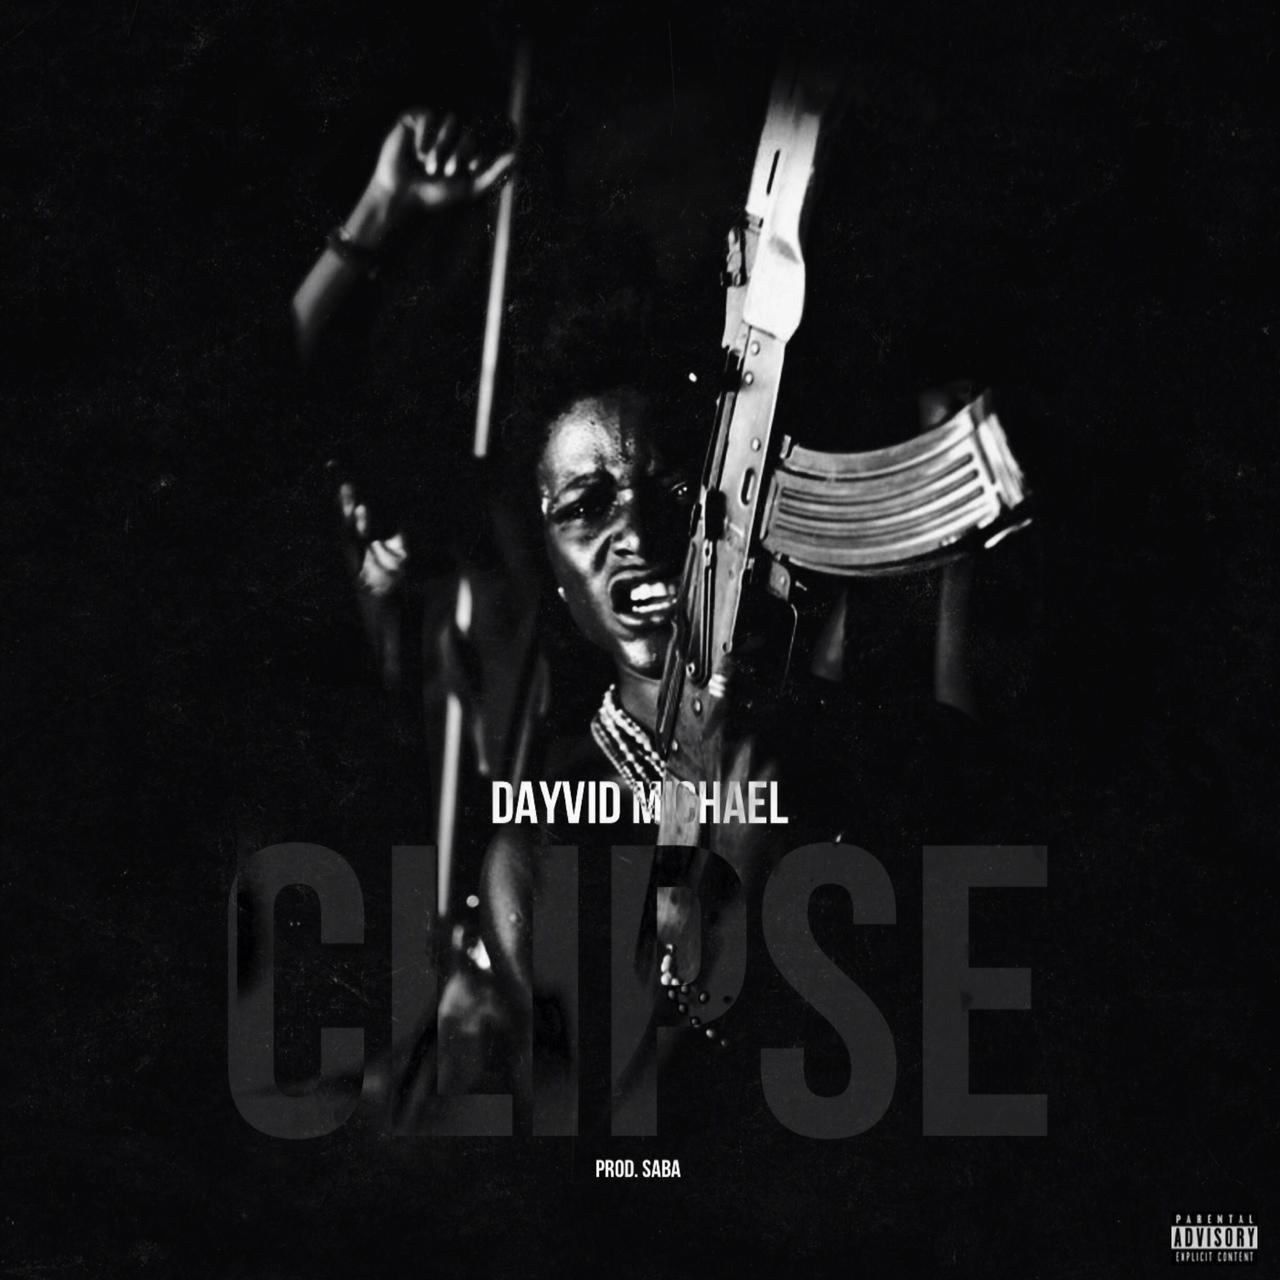 Dayvid Michael - Clipse (Prod. SabaPIVOT)